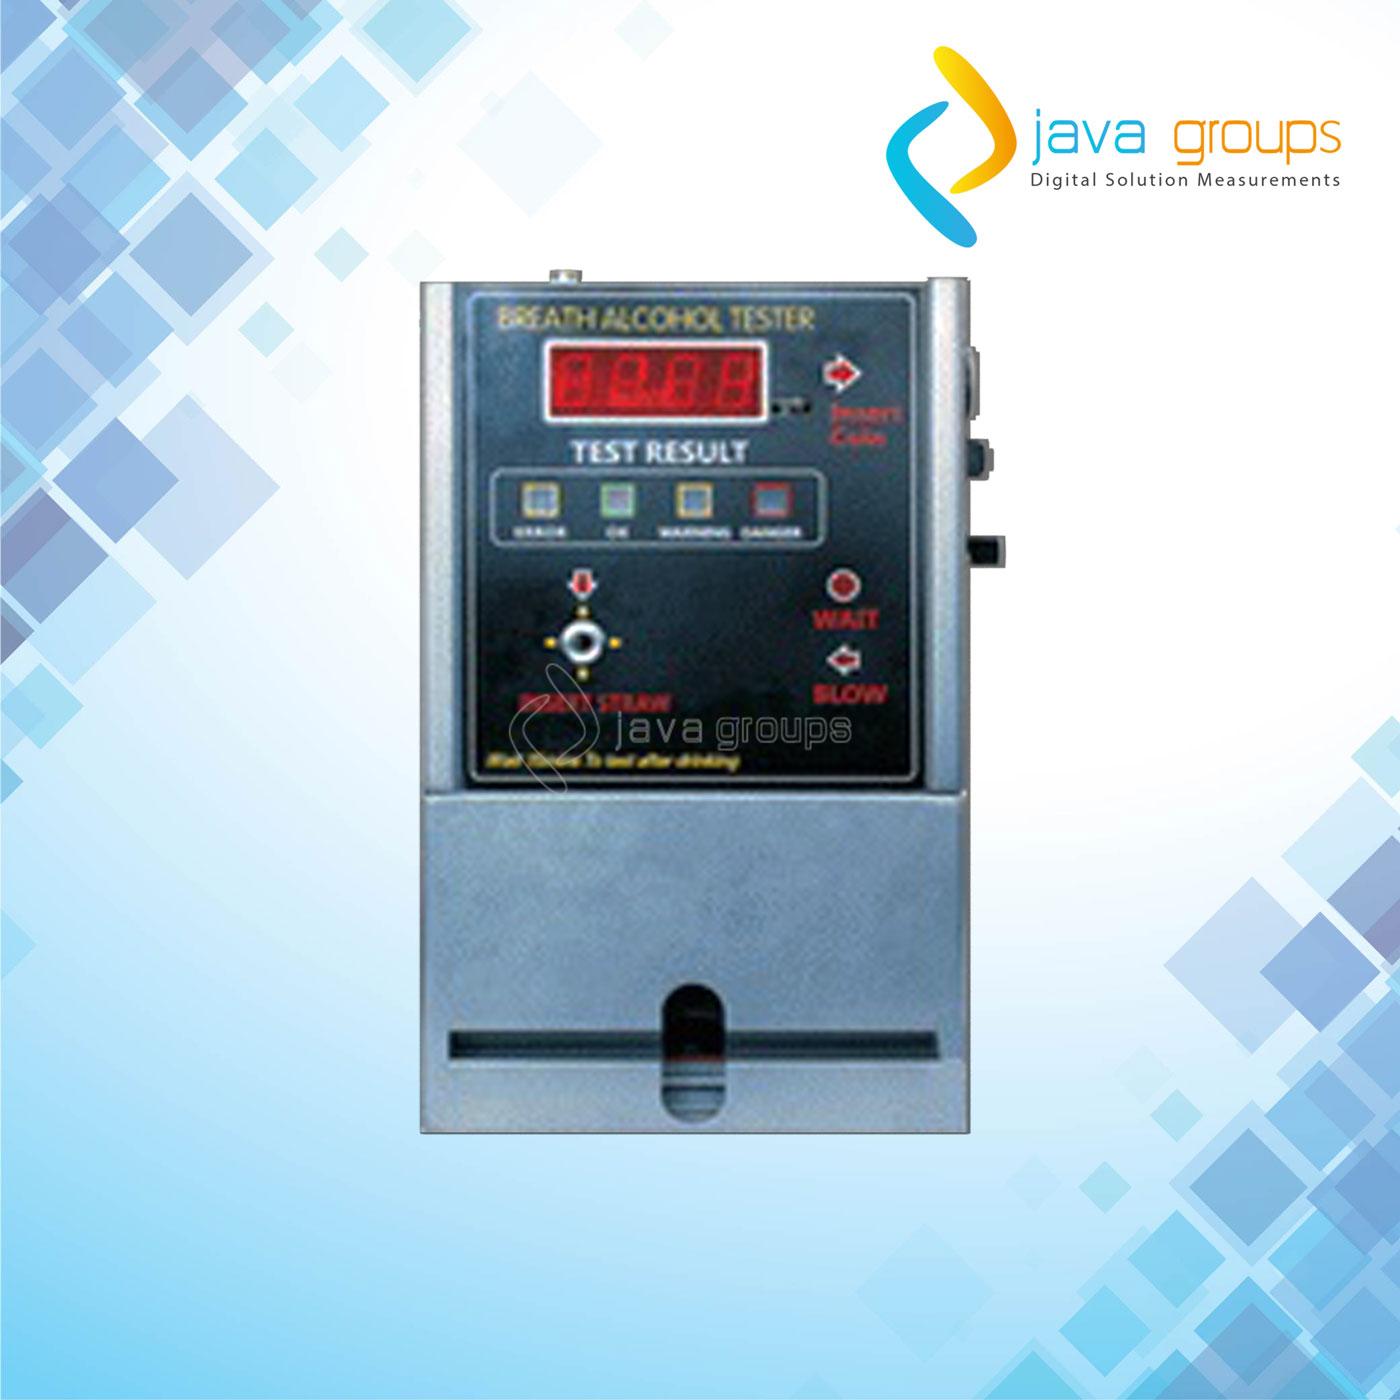 Alat Pengukur Kadar Alkohol Tester Digital Portabel Seri AMT319